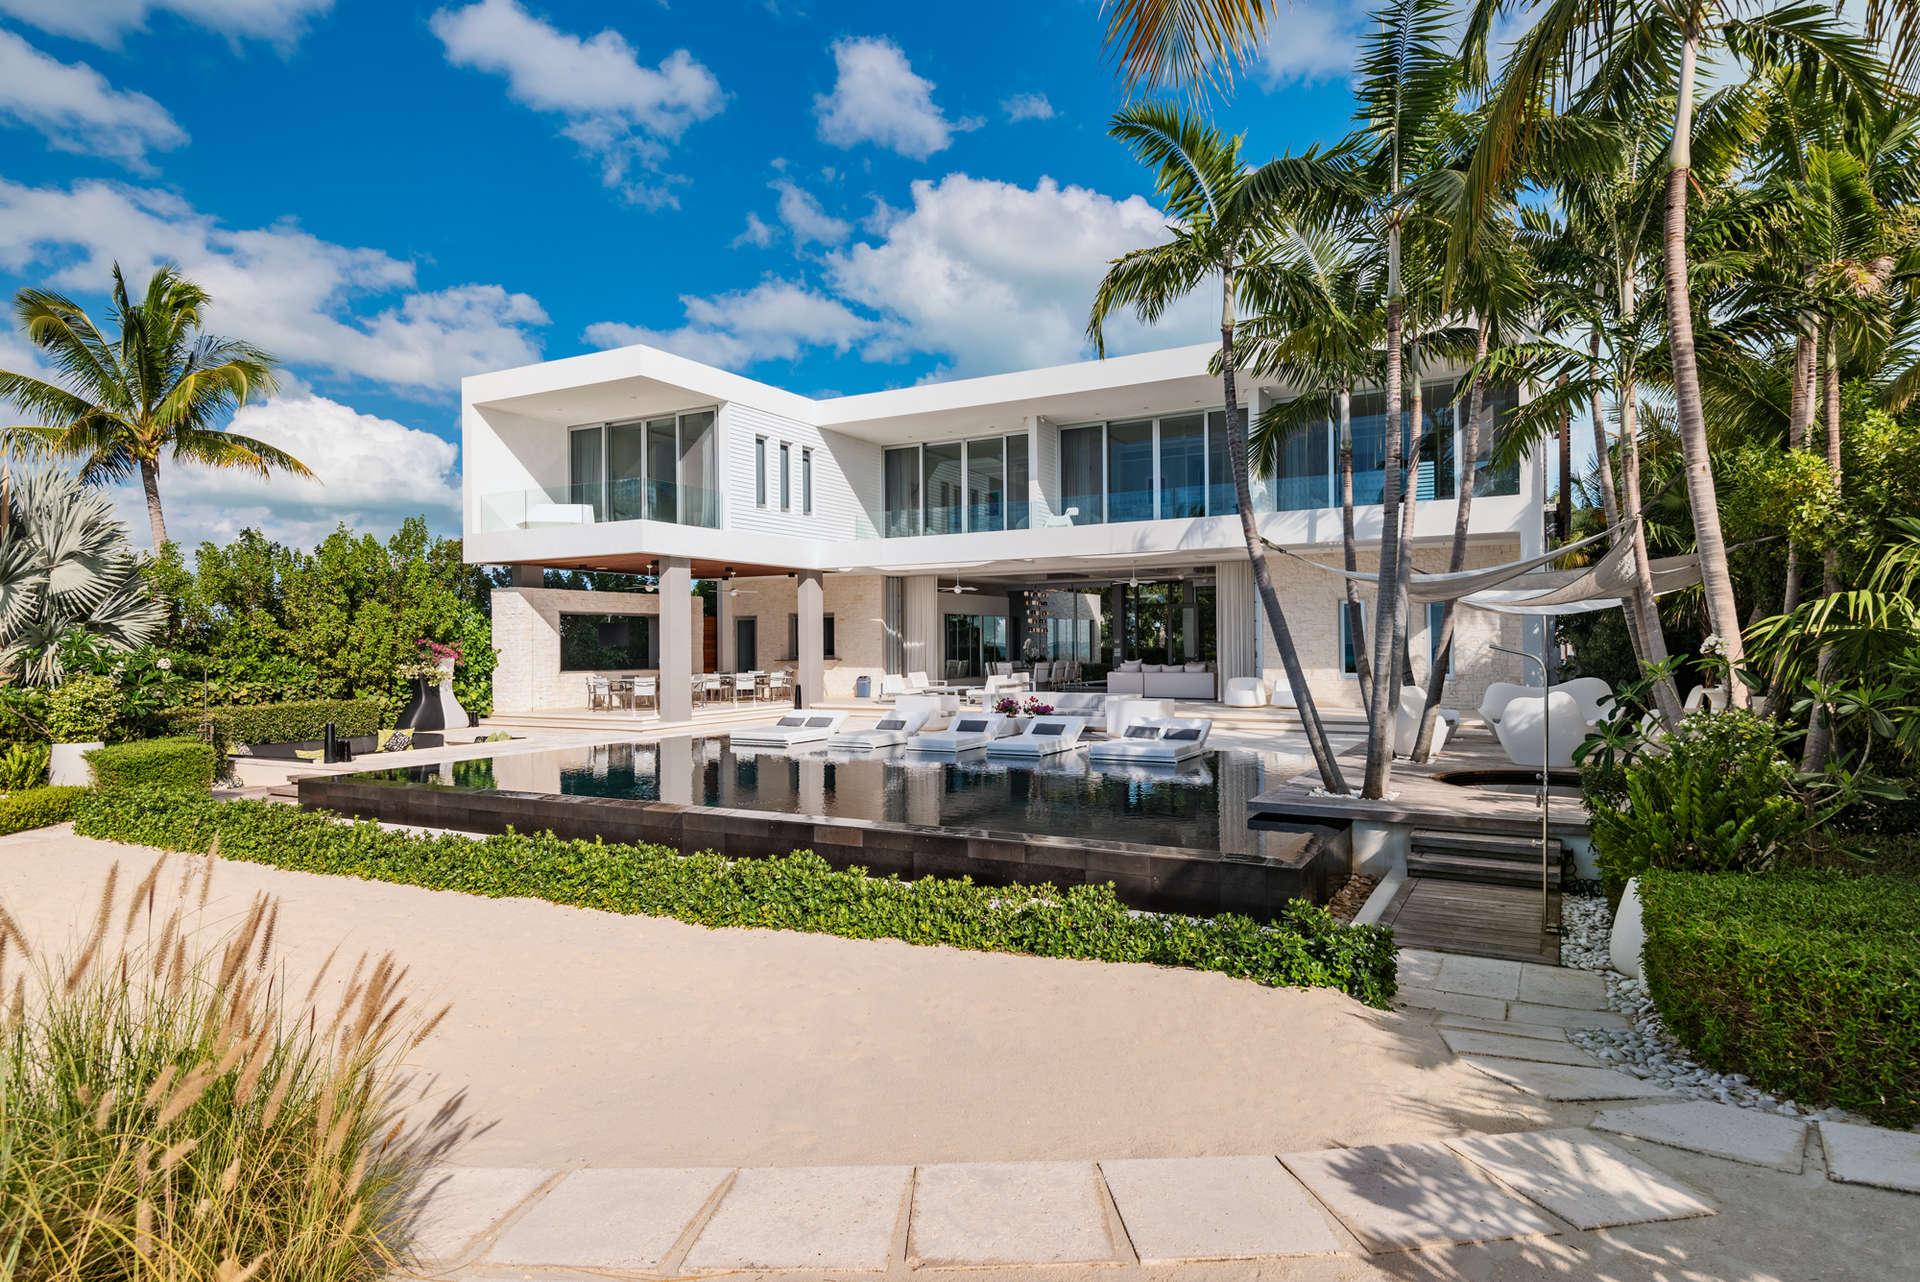 Luxury villa rentals caribbean - Turks and caicos - Providenciales - Grace bay - Villa Awa - Image 1/27